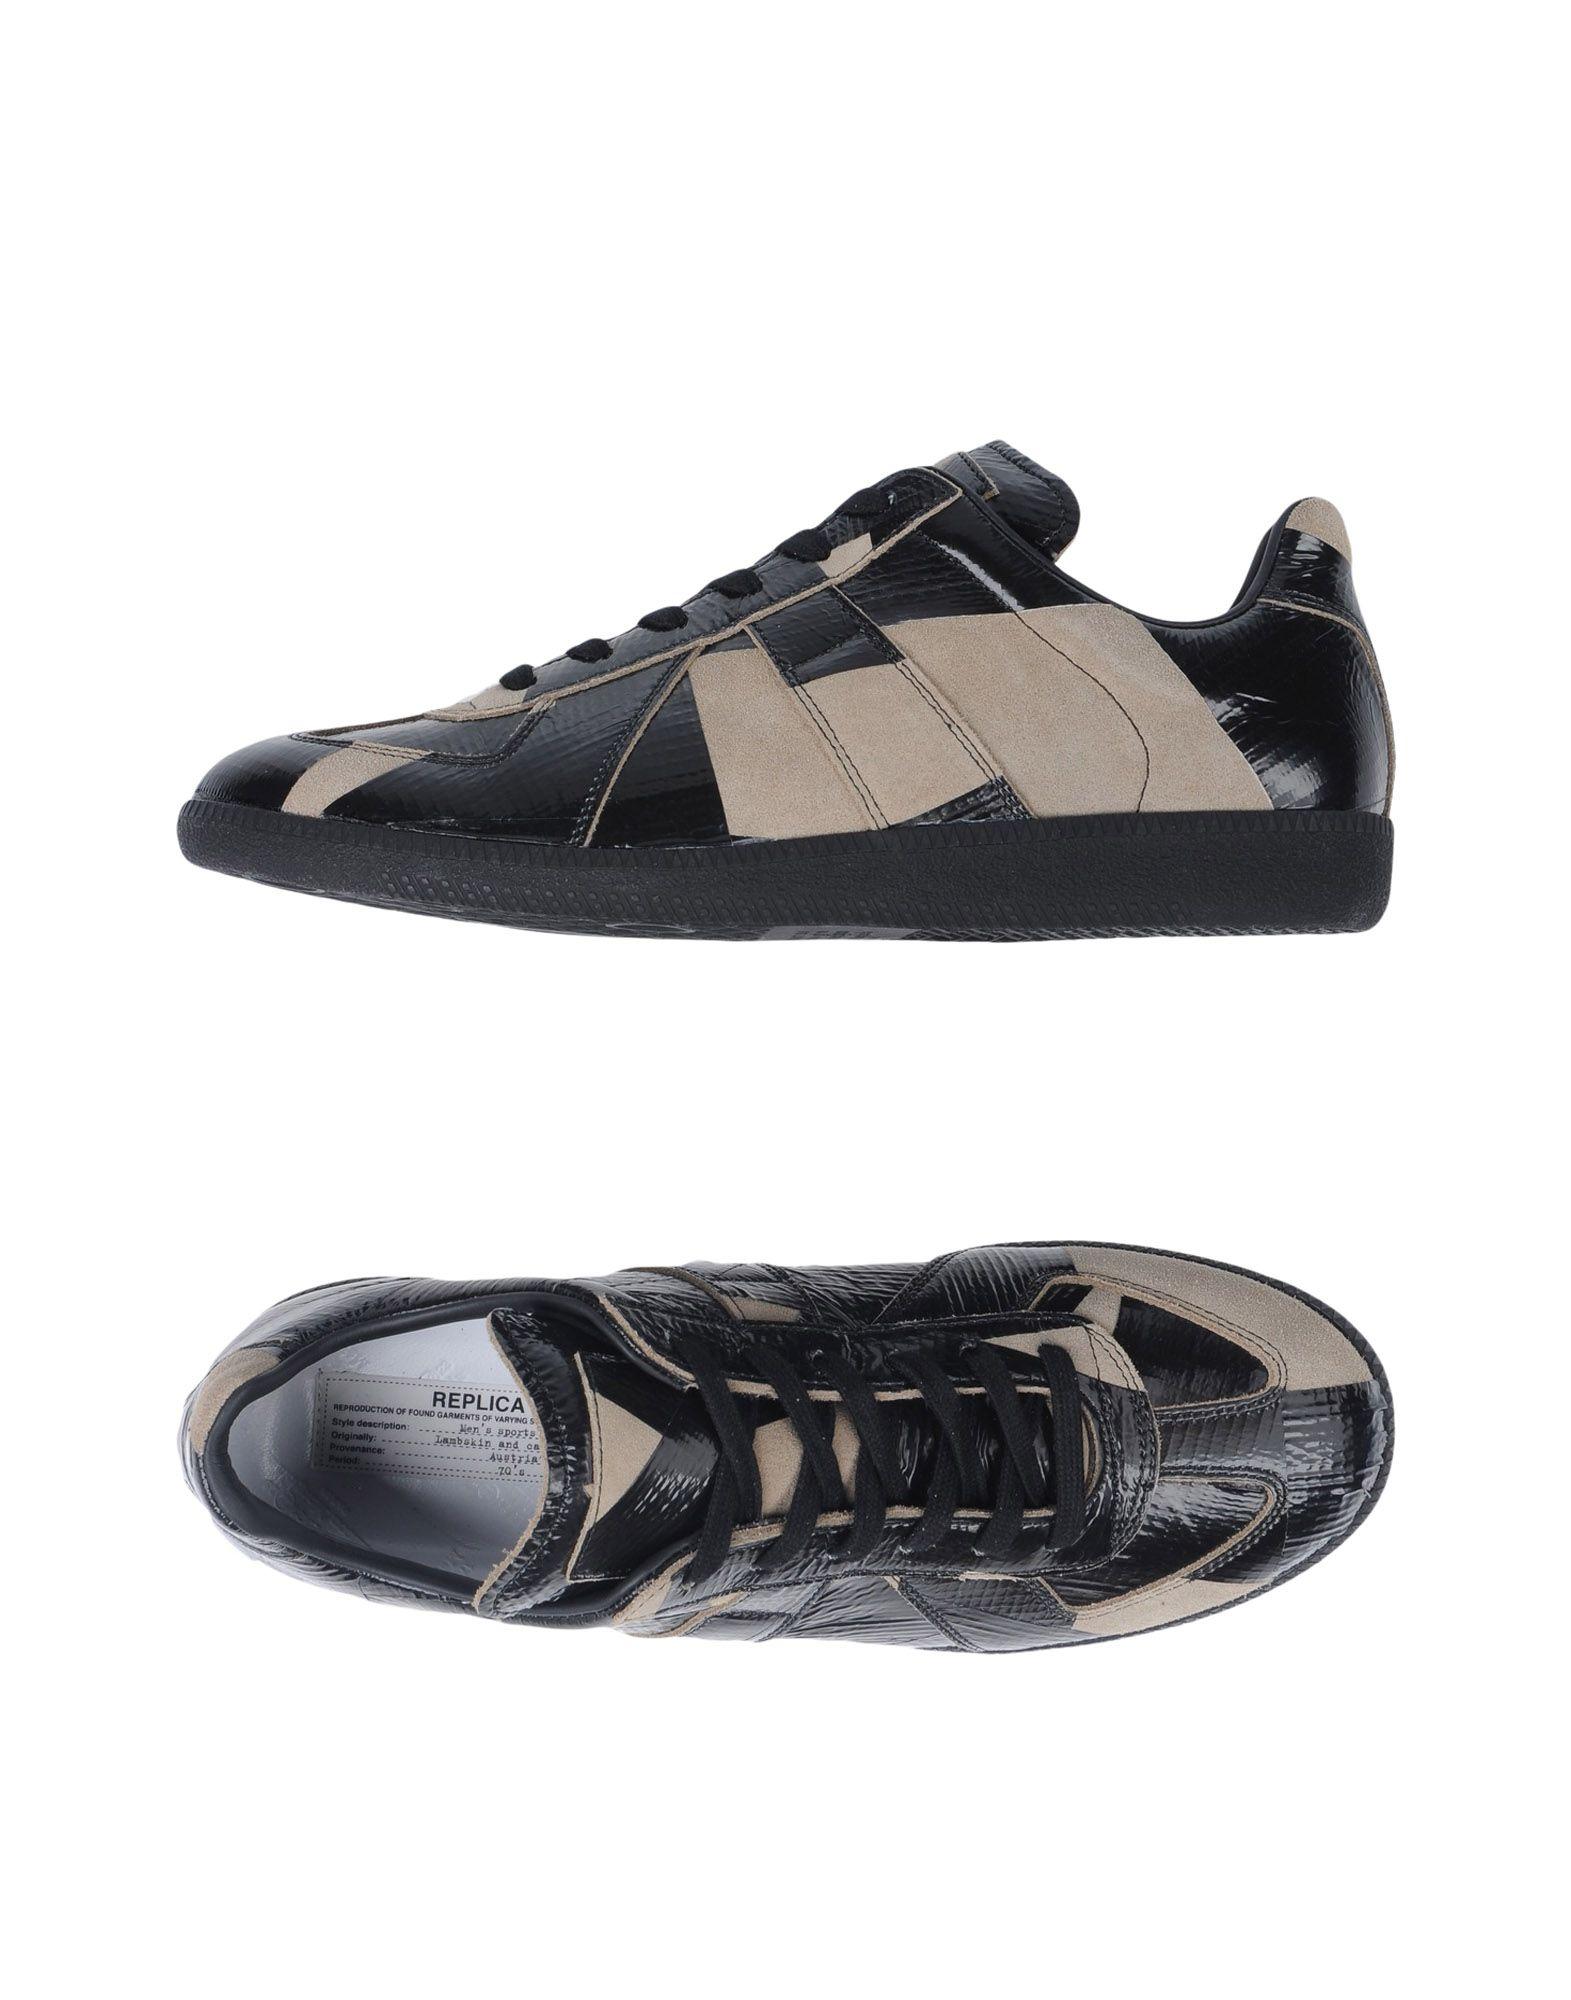 Maison Margiela Sneakers Herren  11340335AE Gute Qualität beliebte Schuhe